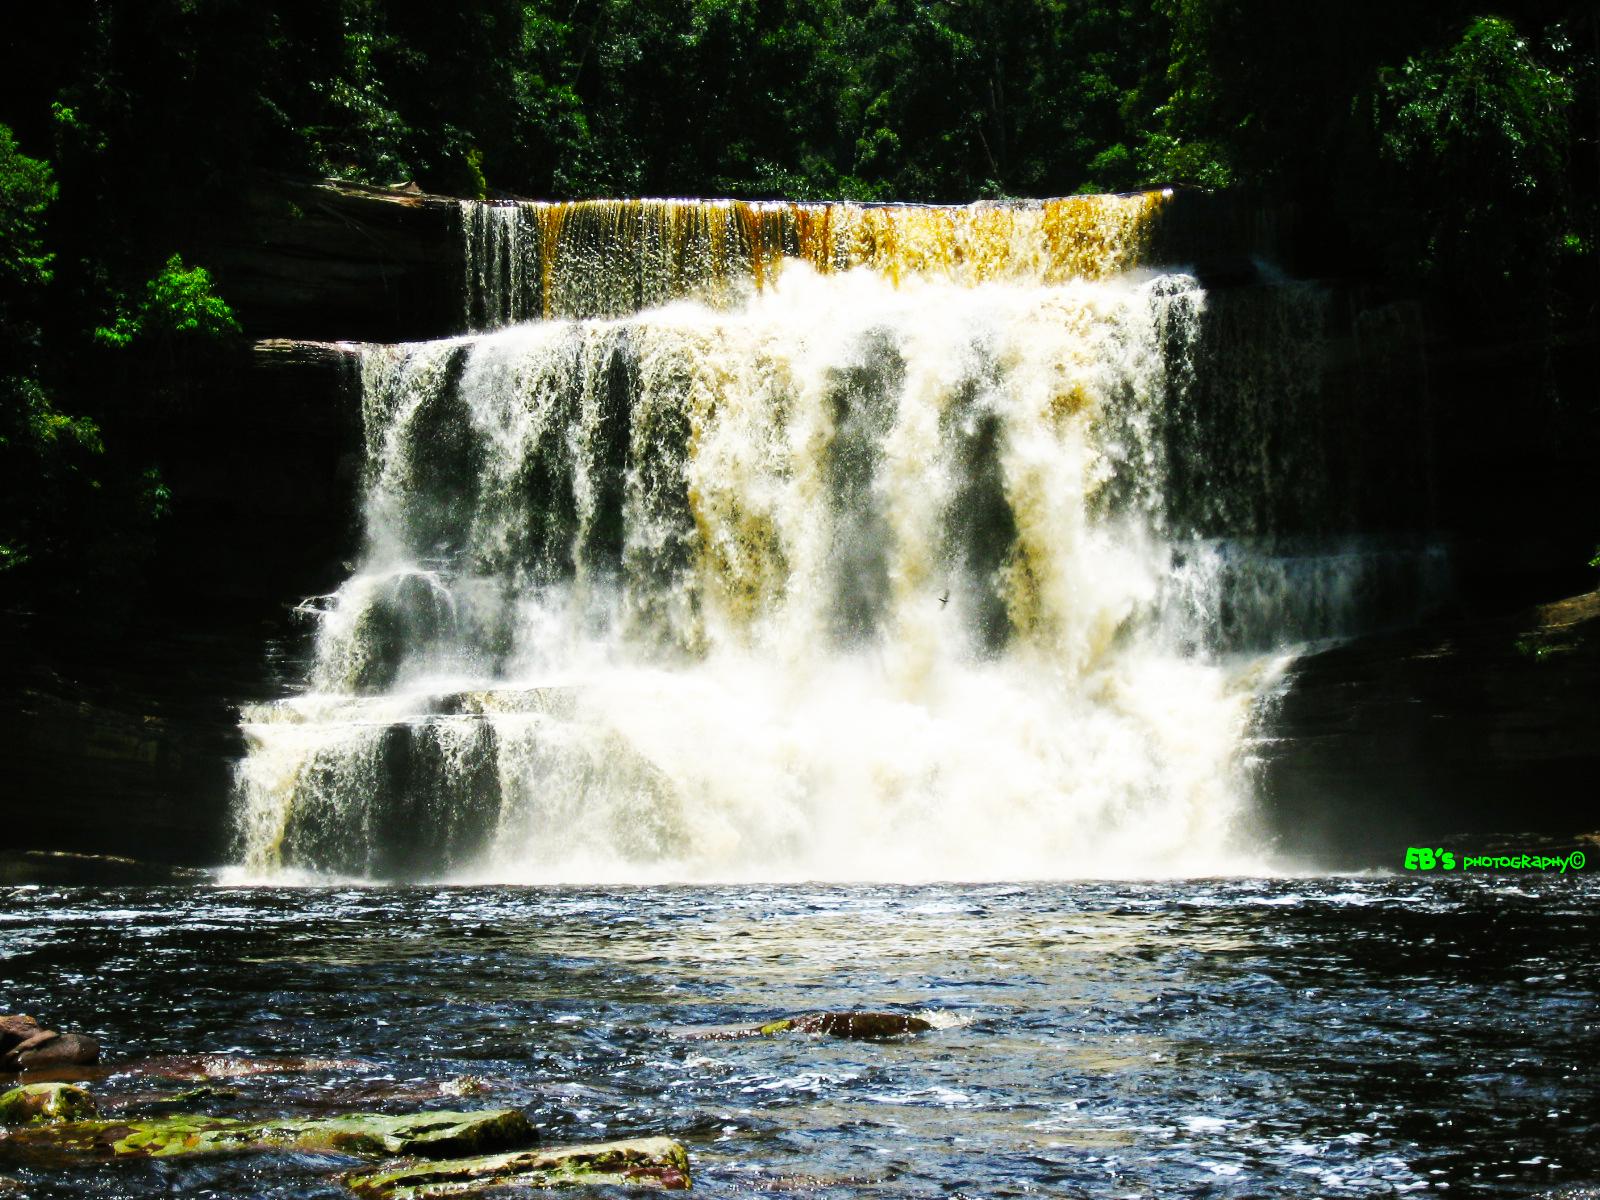 how to get to maliau basin